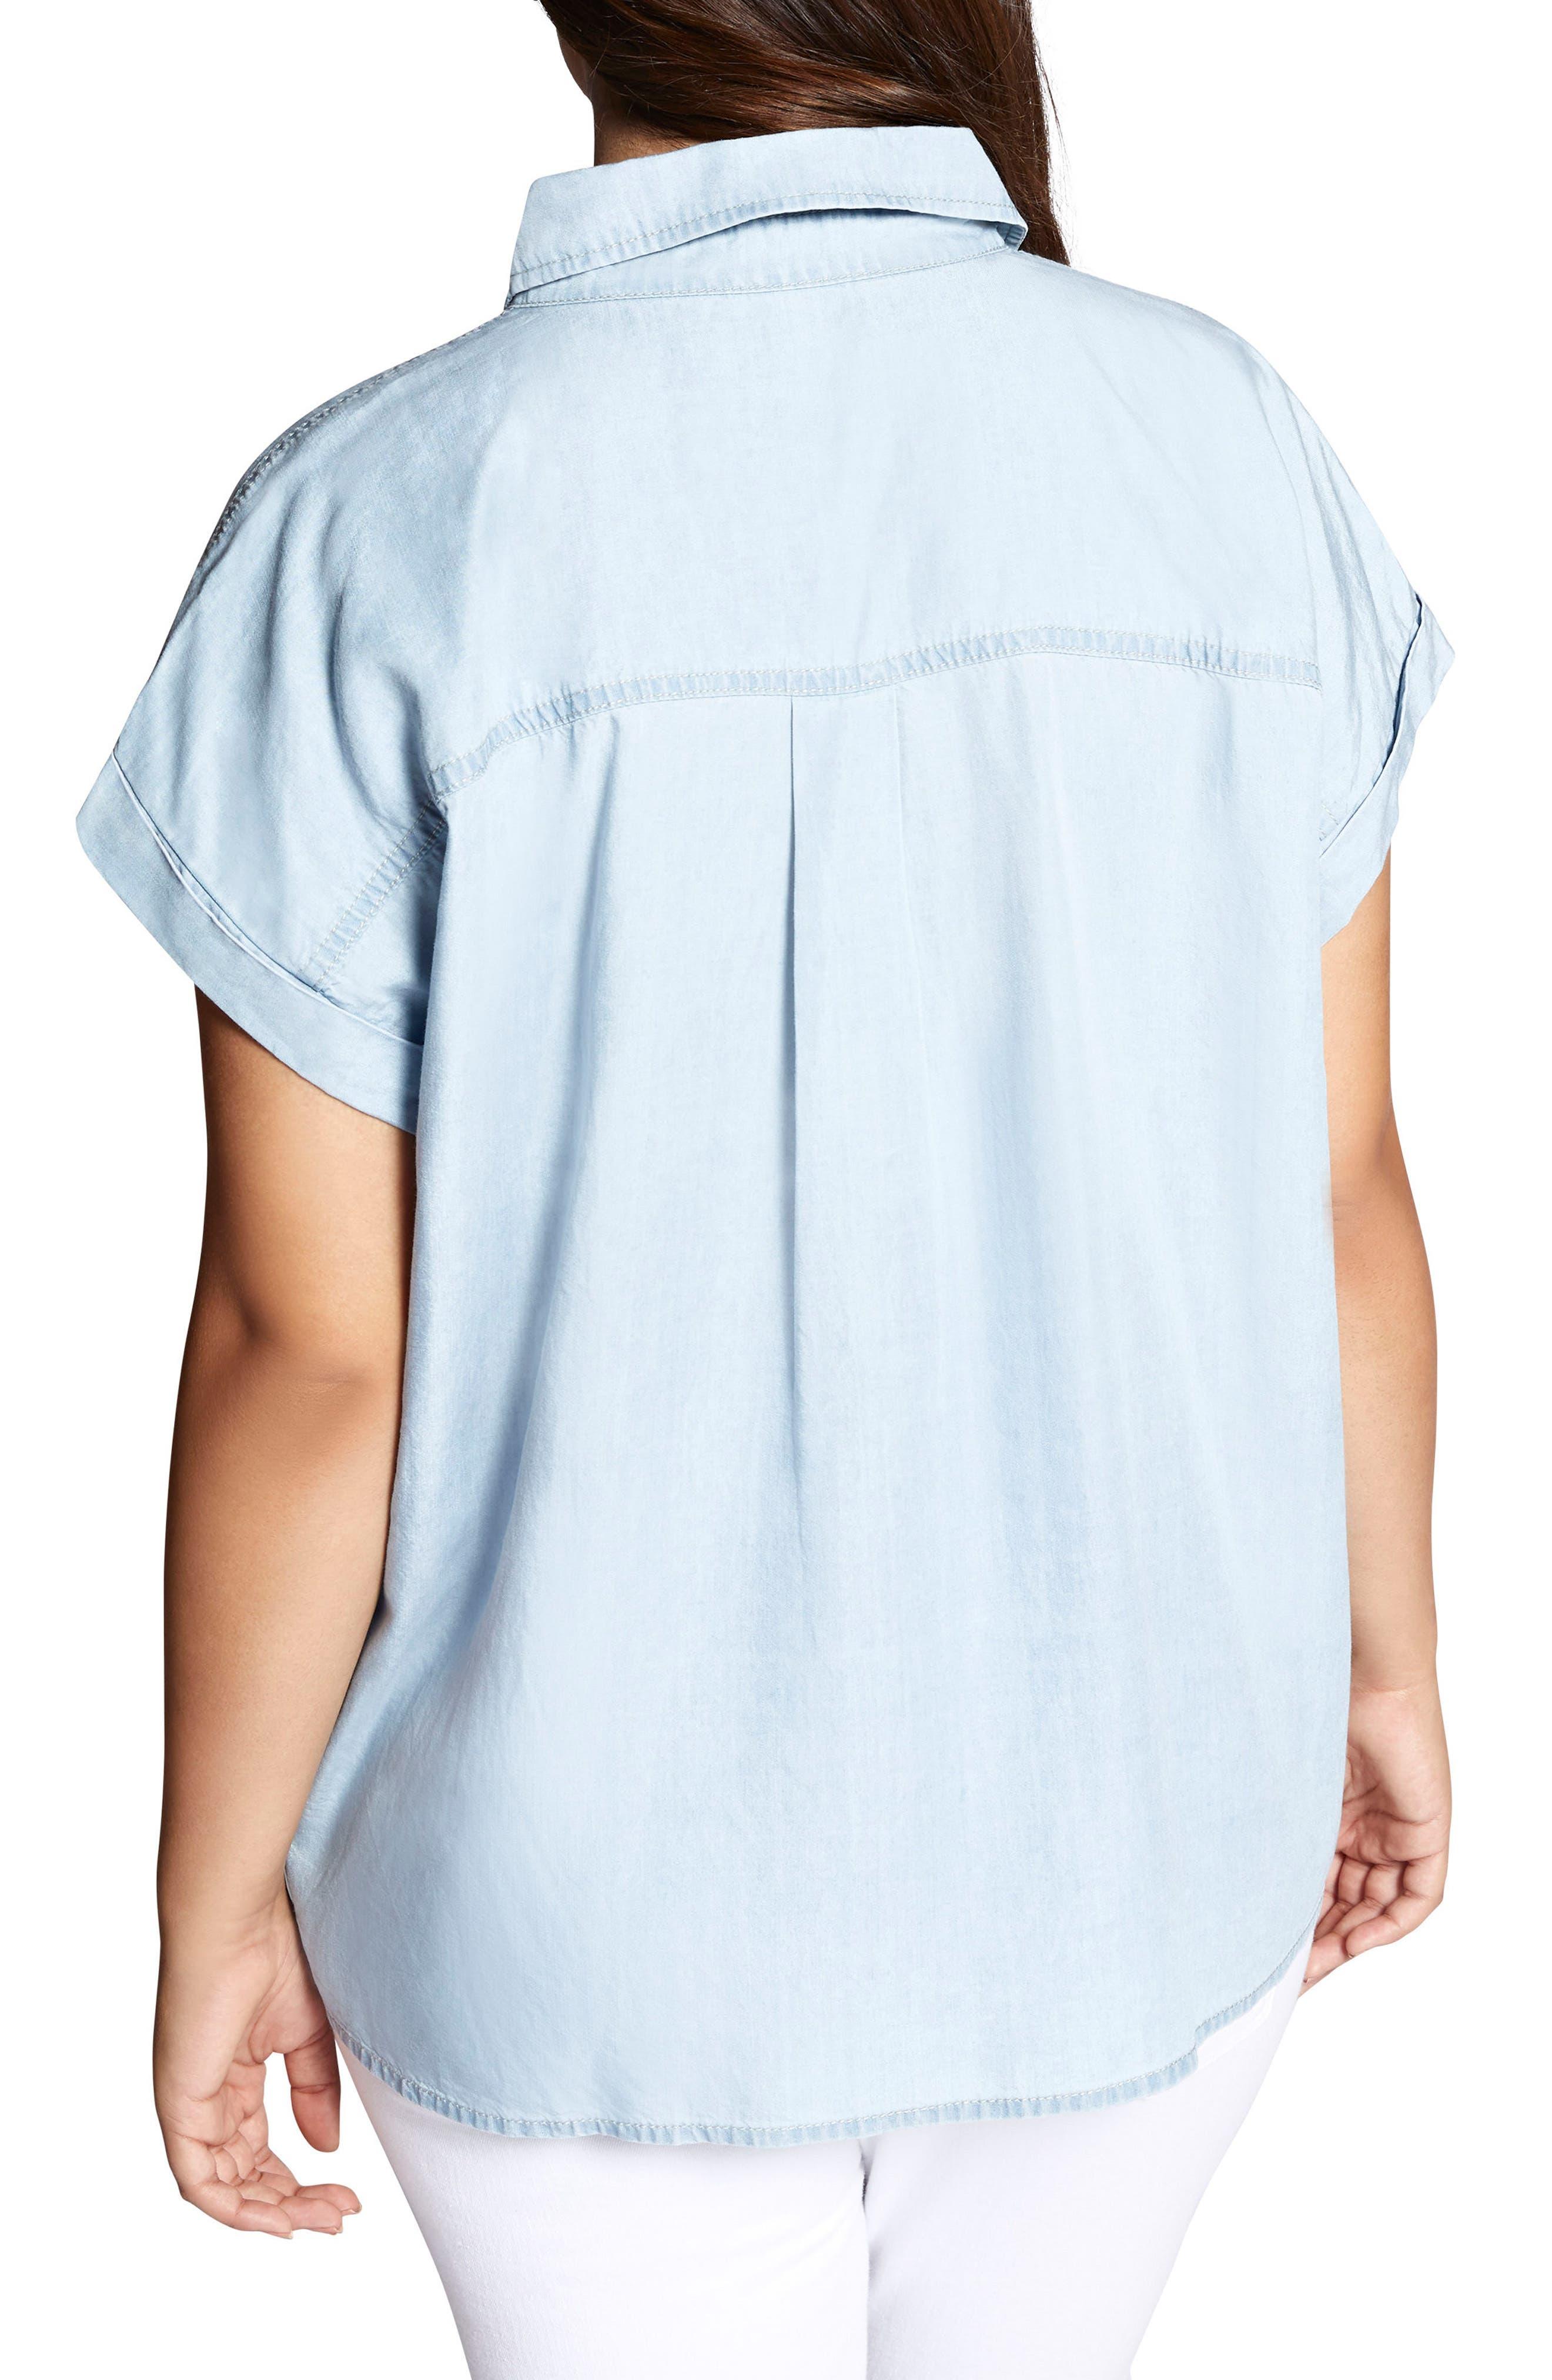 SANCTUARY,                             Mod Short Sleeve Boyfriend Shirt,                             Alternate thumbnail 2, color,                             450